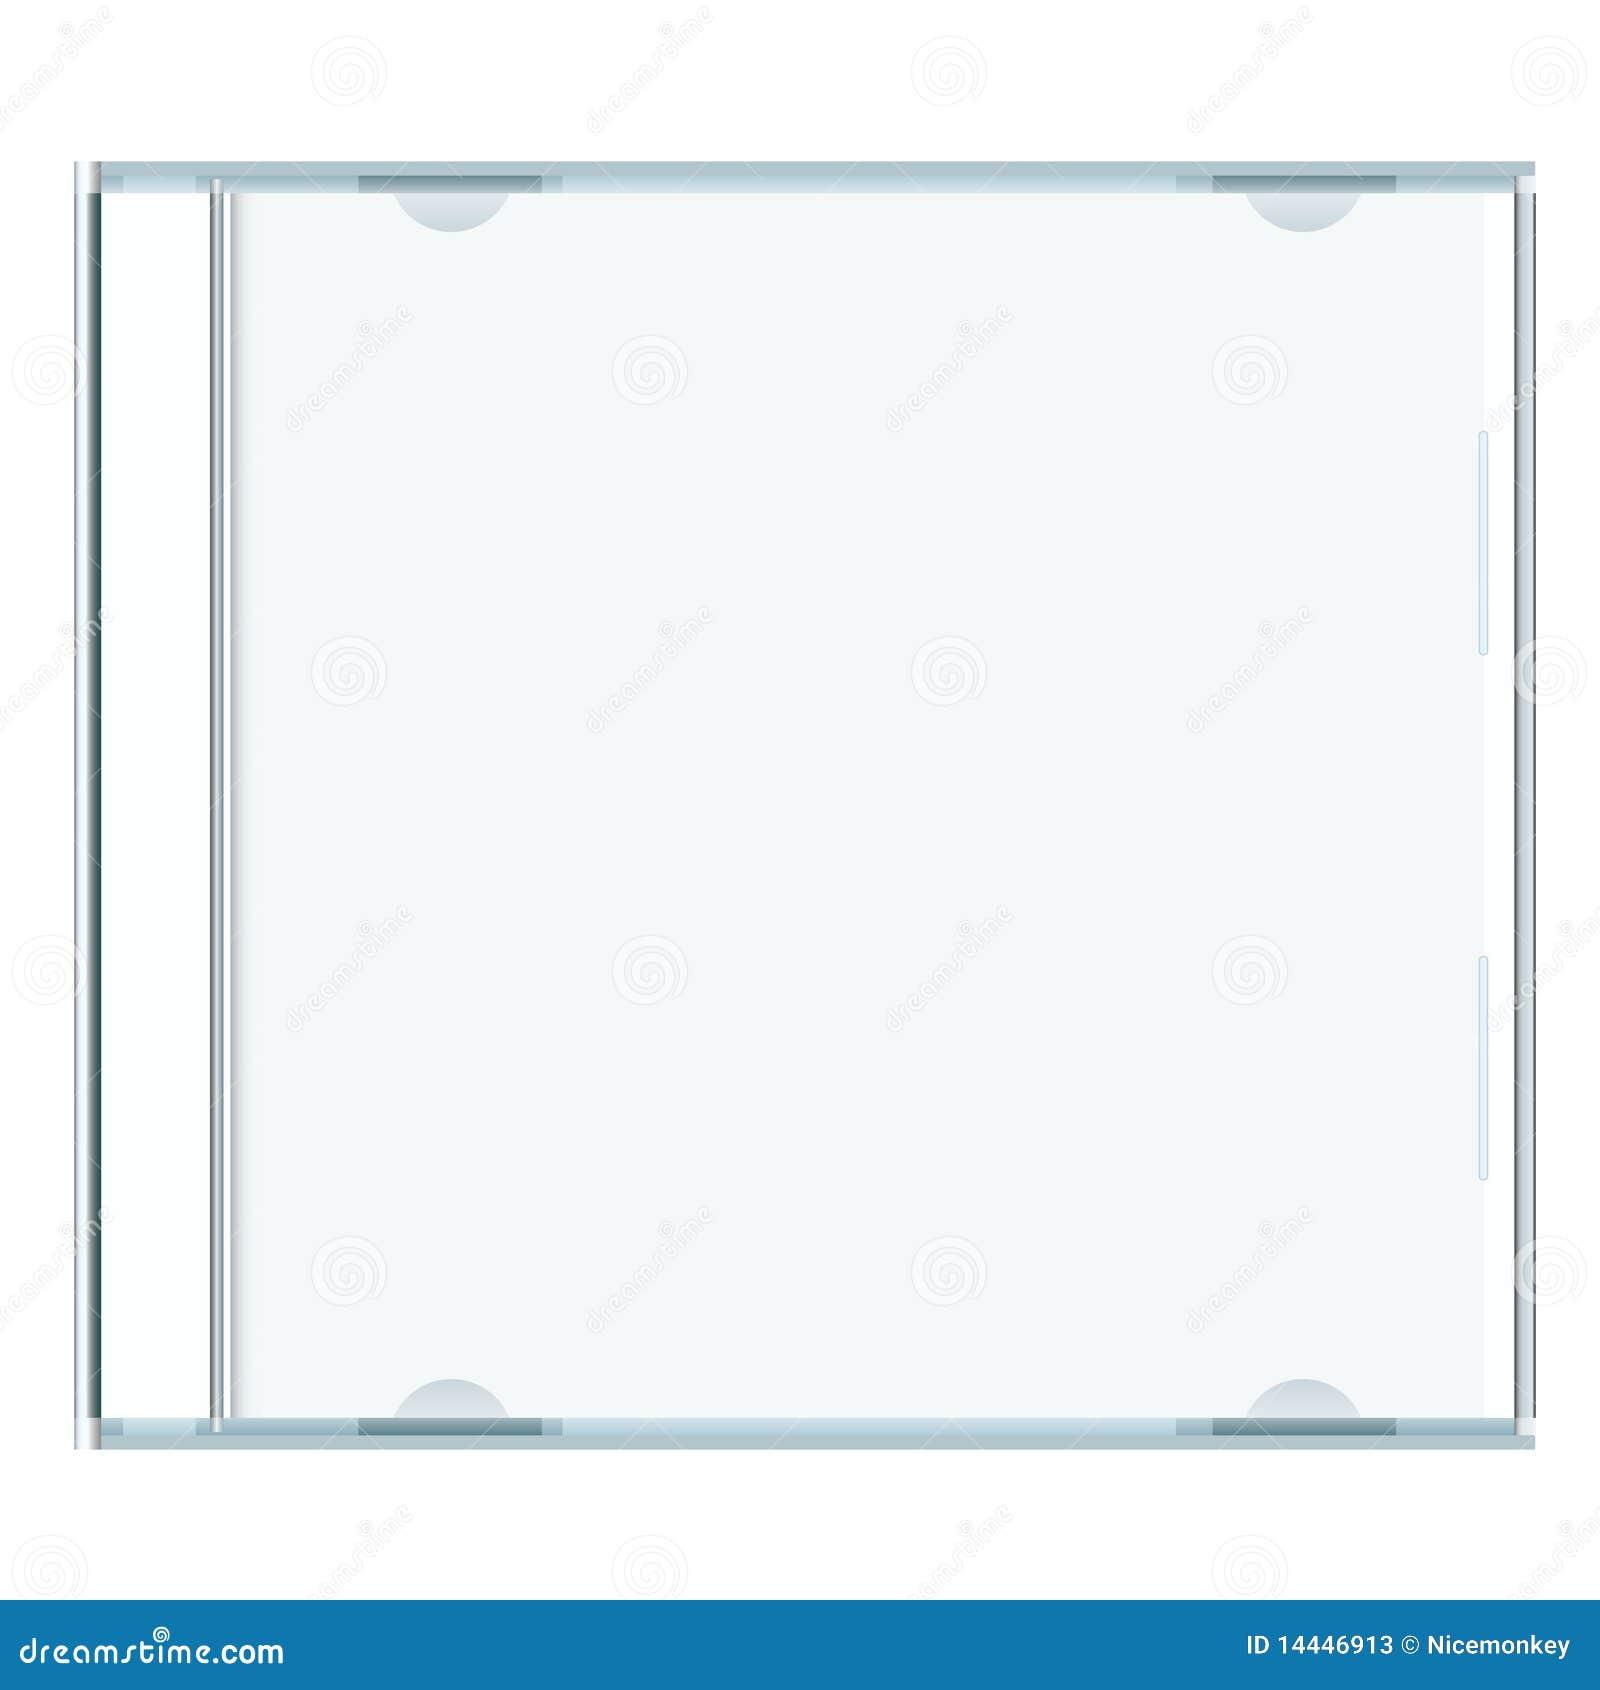 blank cd case template - photo #35